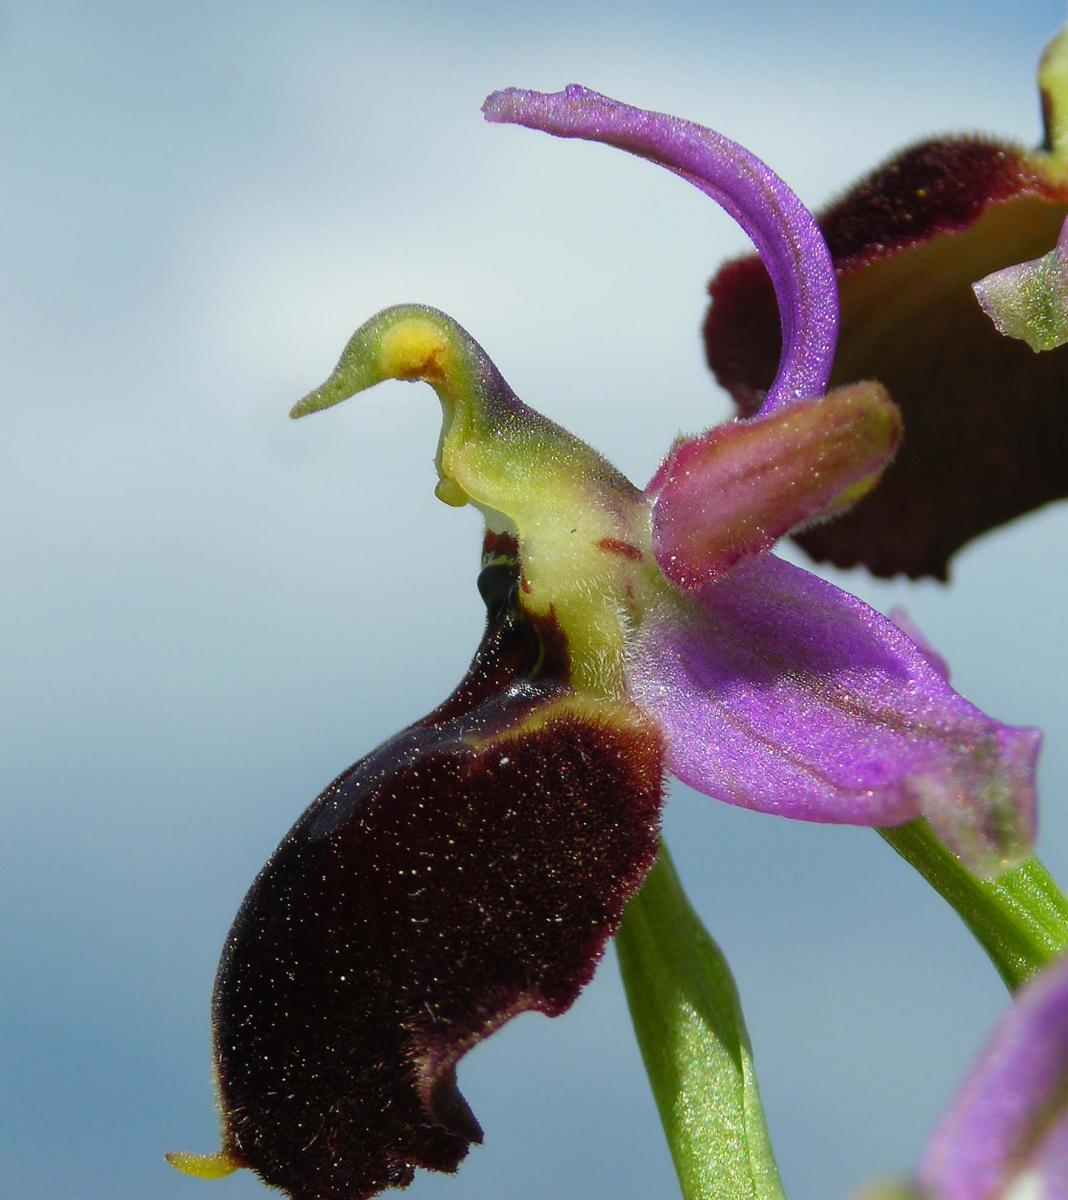 Ophrys x laconensis Scrugli et Grasso